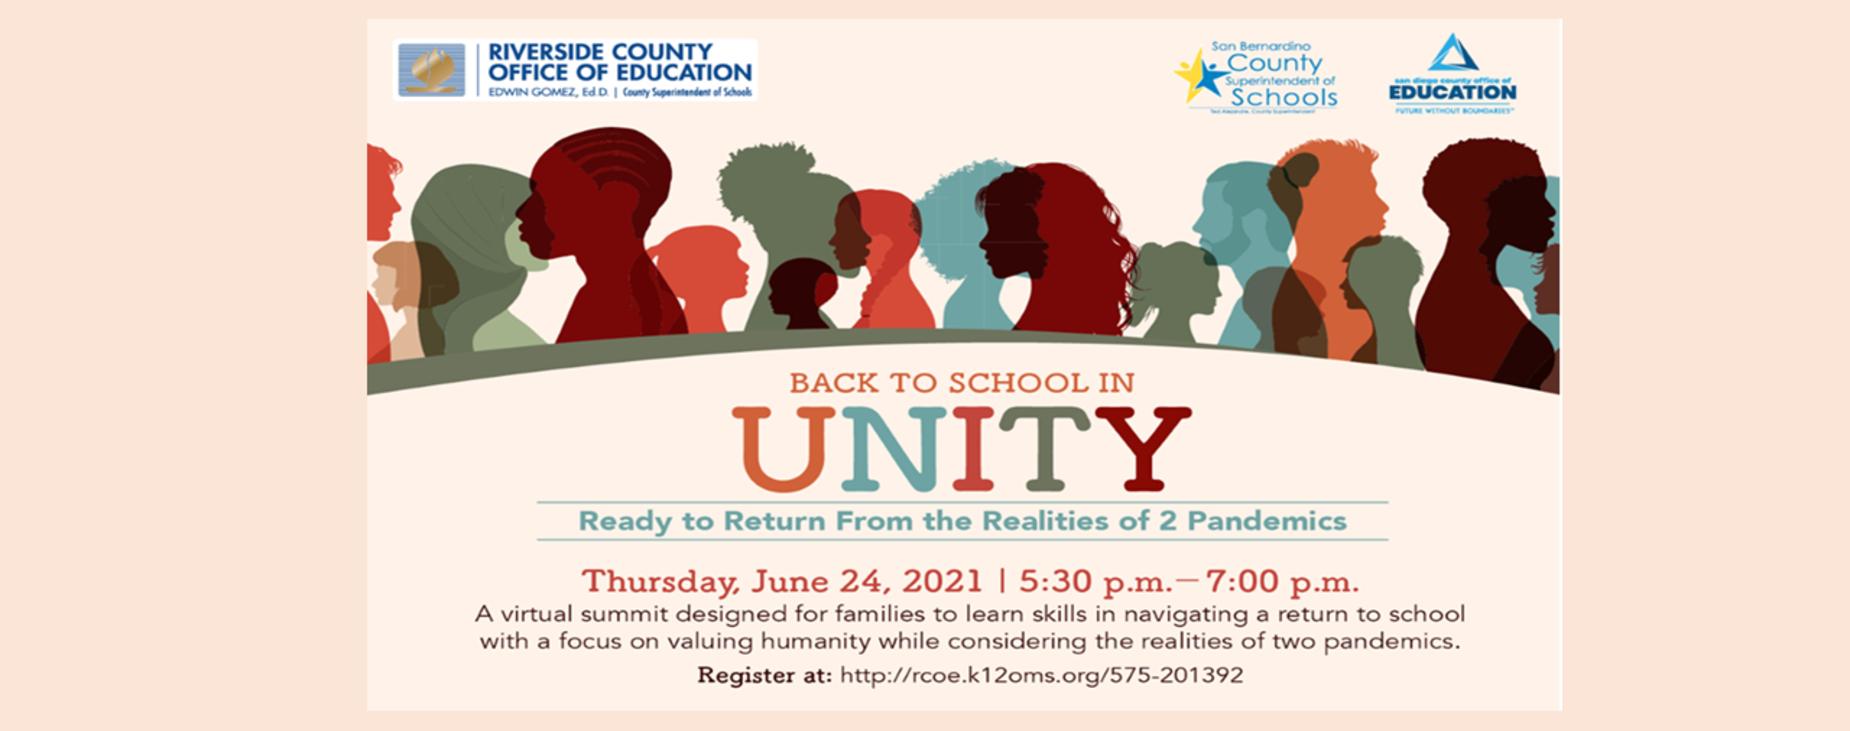 Back to School In Unity, Presentation by RCOE